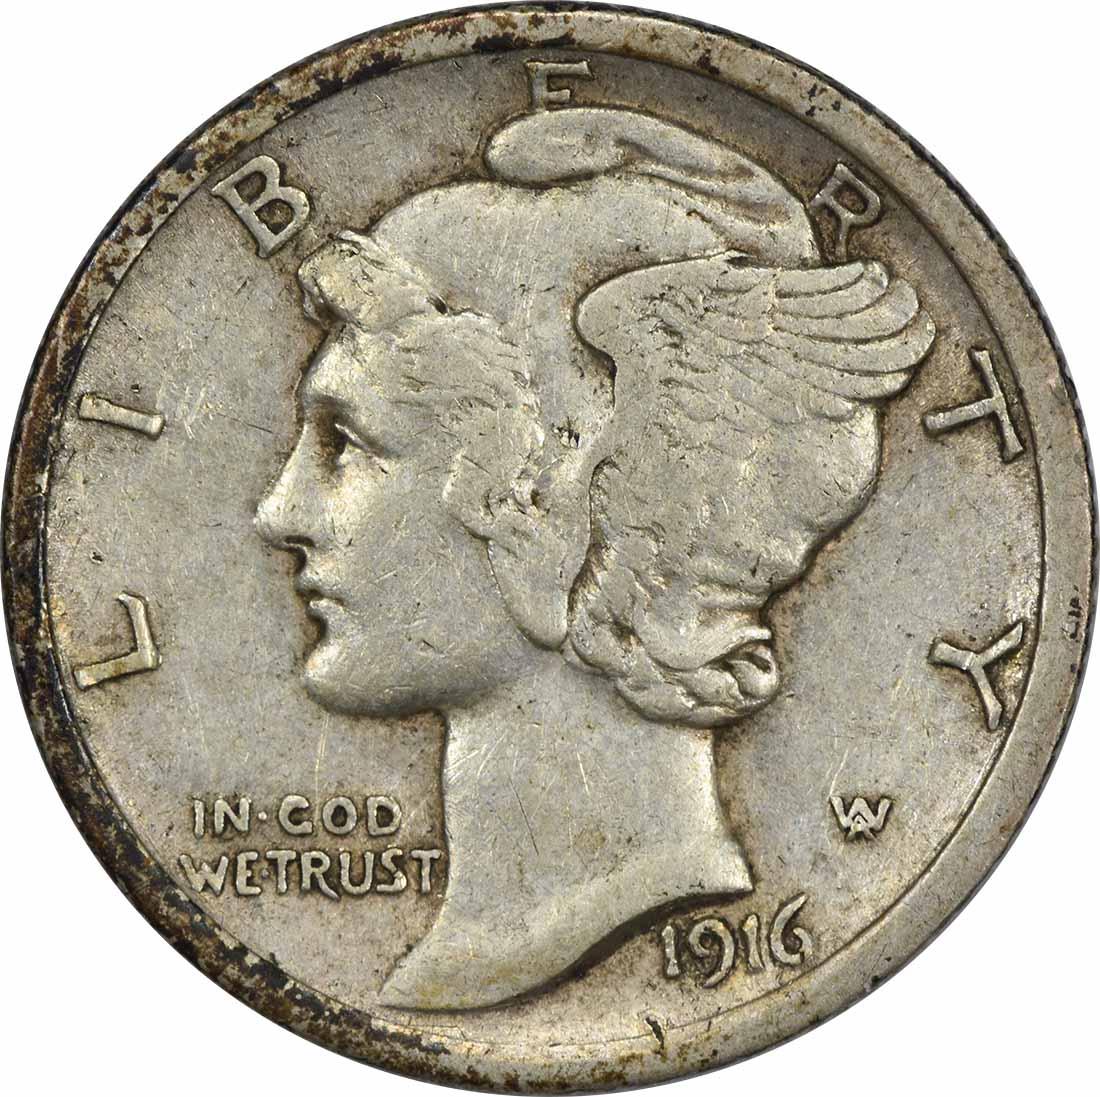 1916 Mercury Silver Dime EF Uncertified